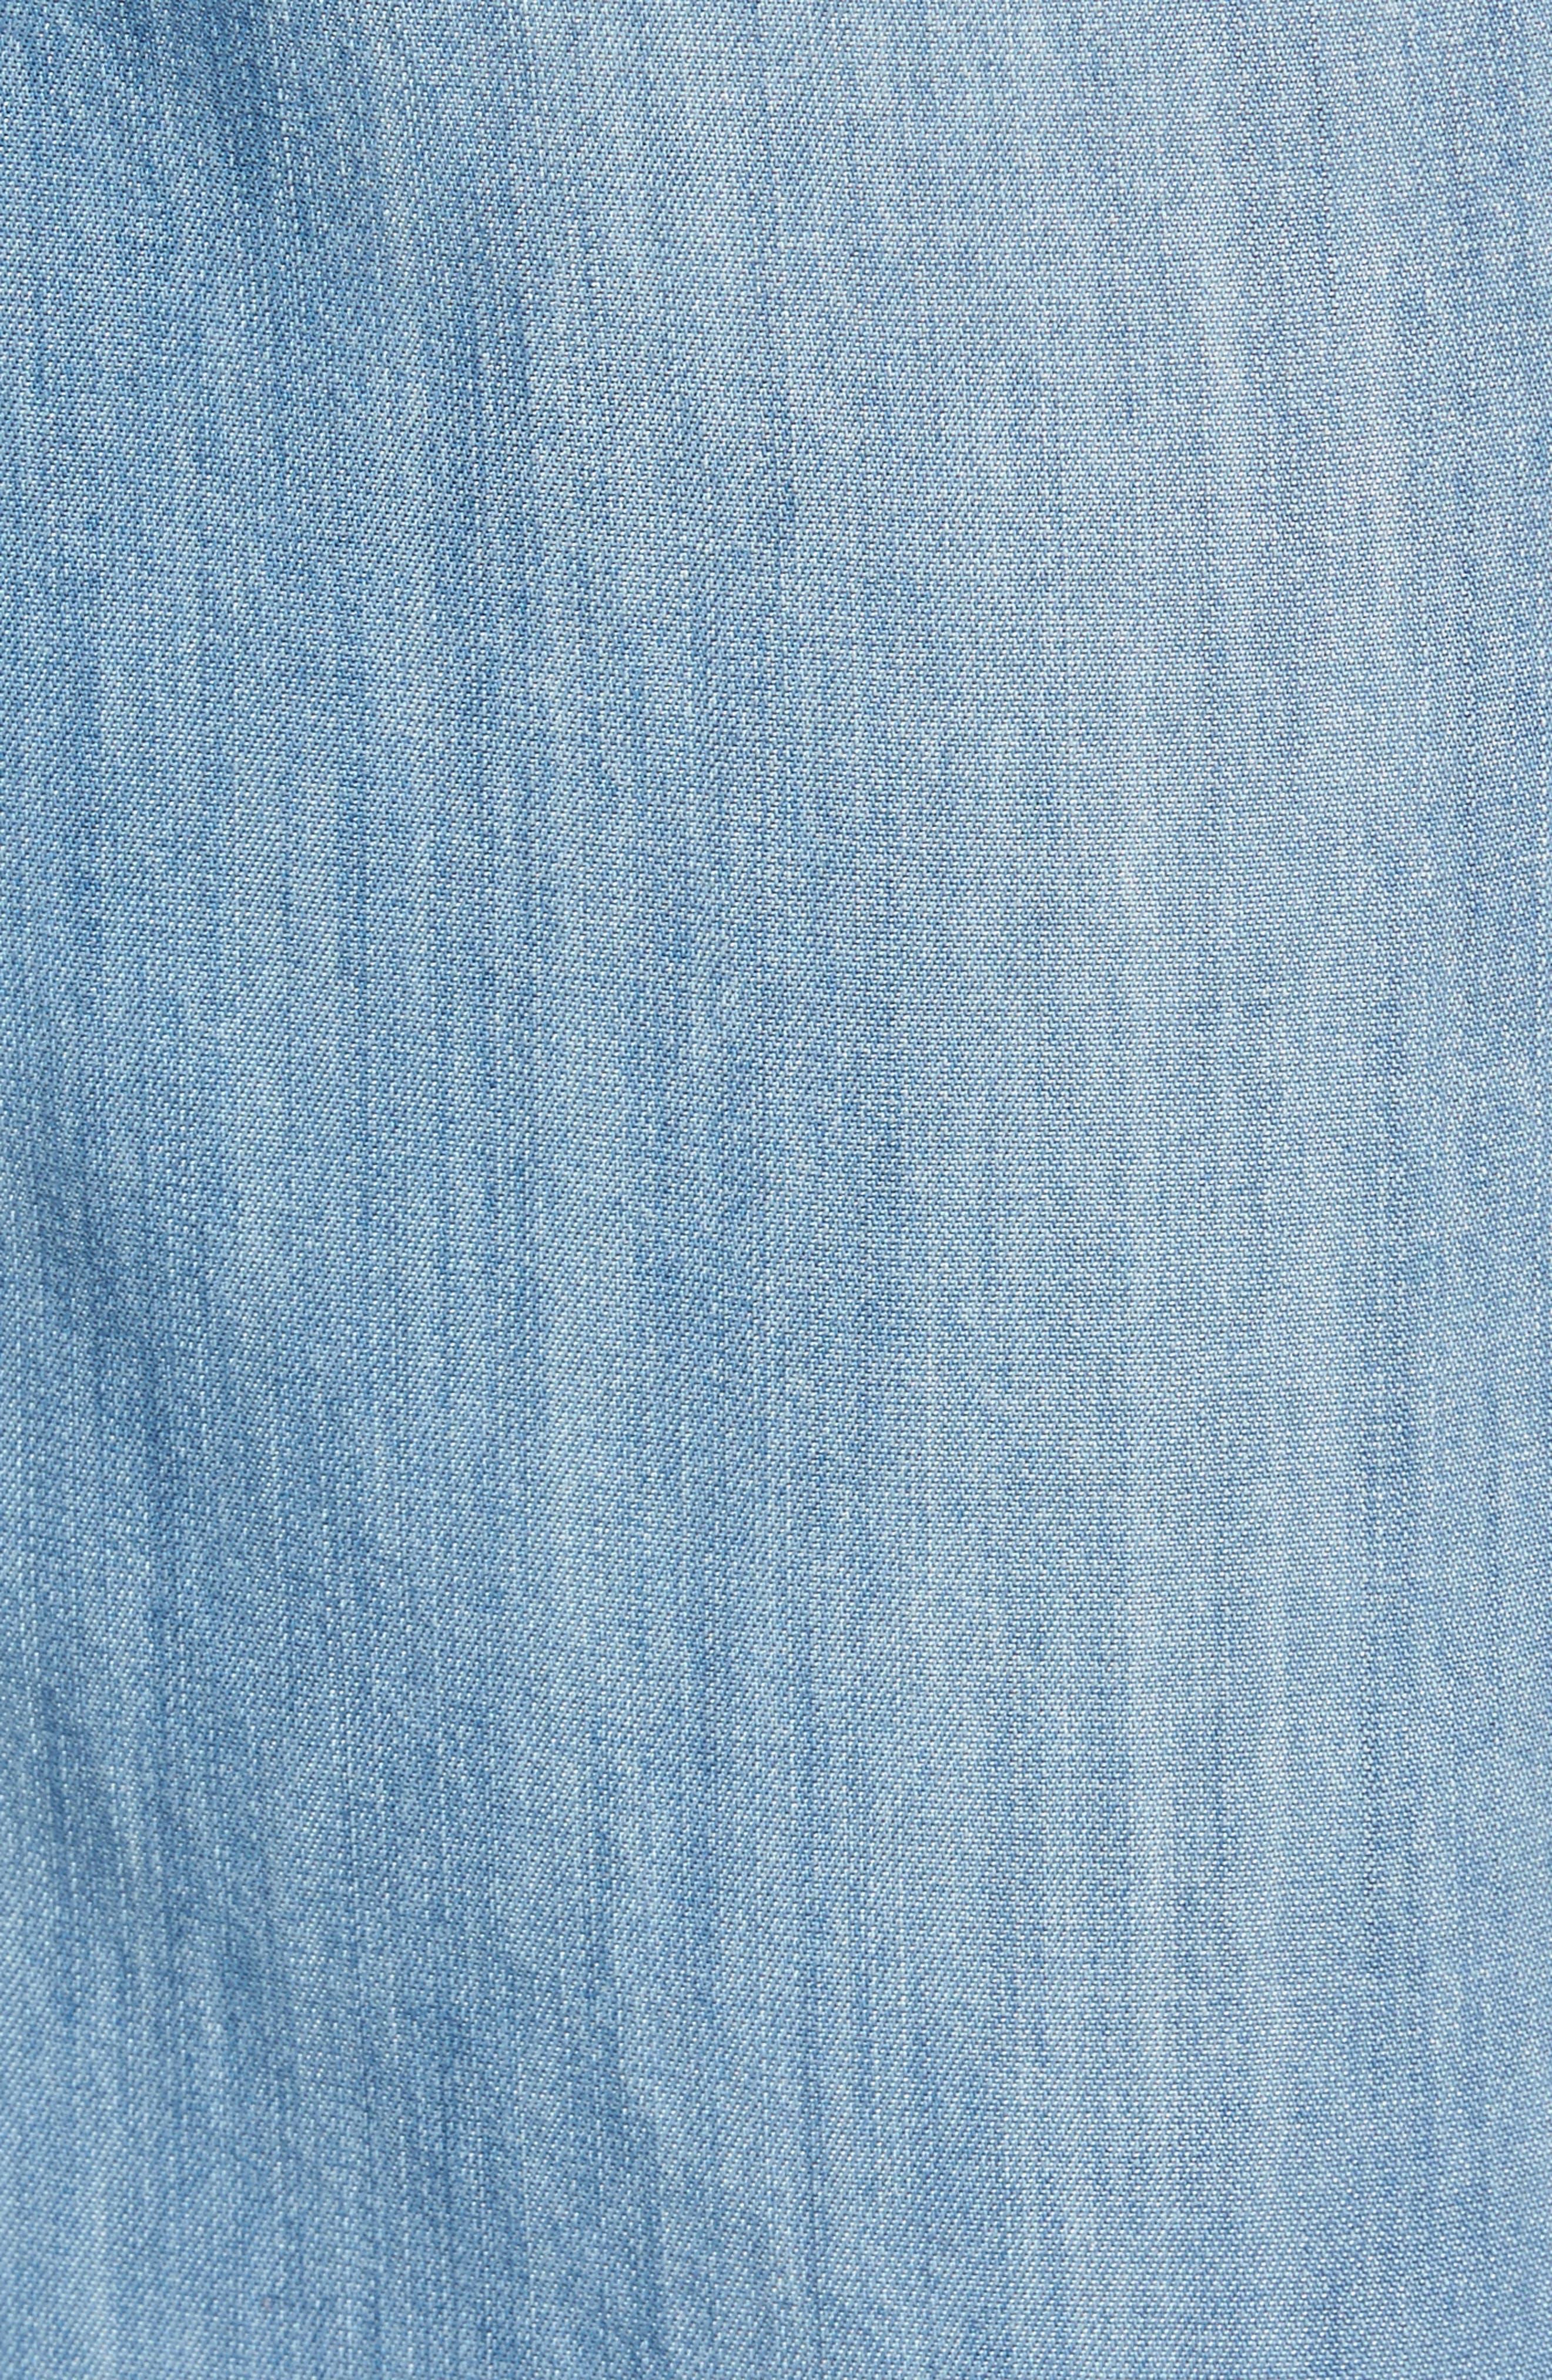 Drawstring Wide Leg Pants,                             Alternate thumbnail 5, color,                             420